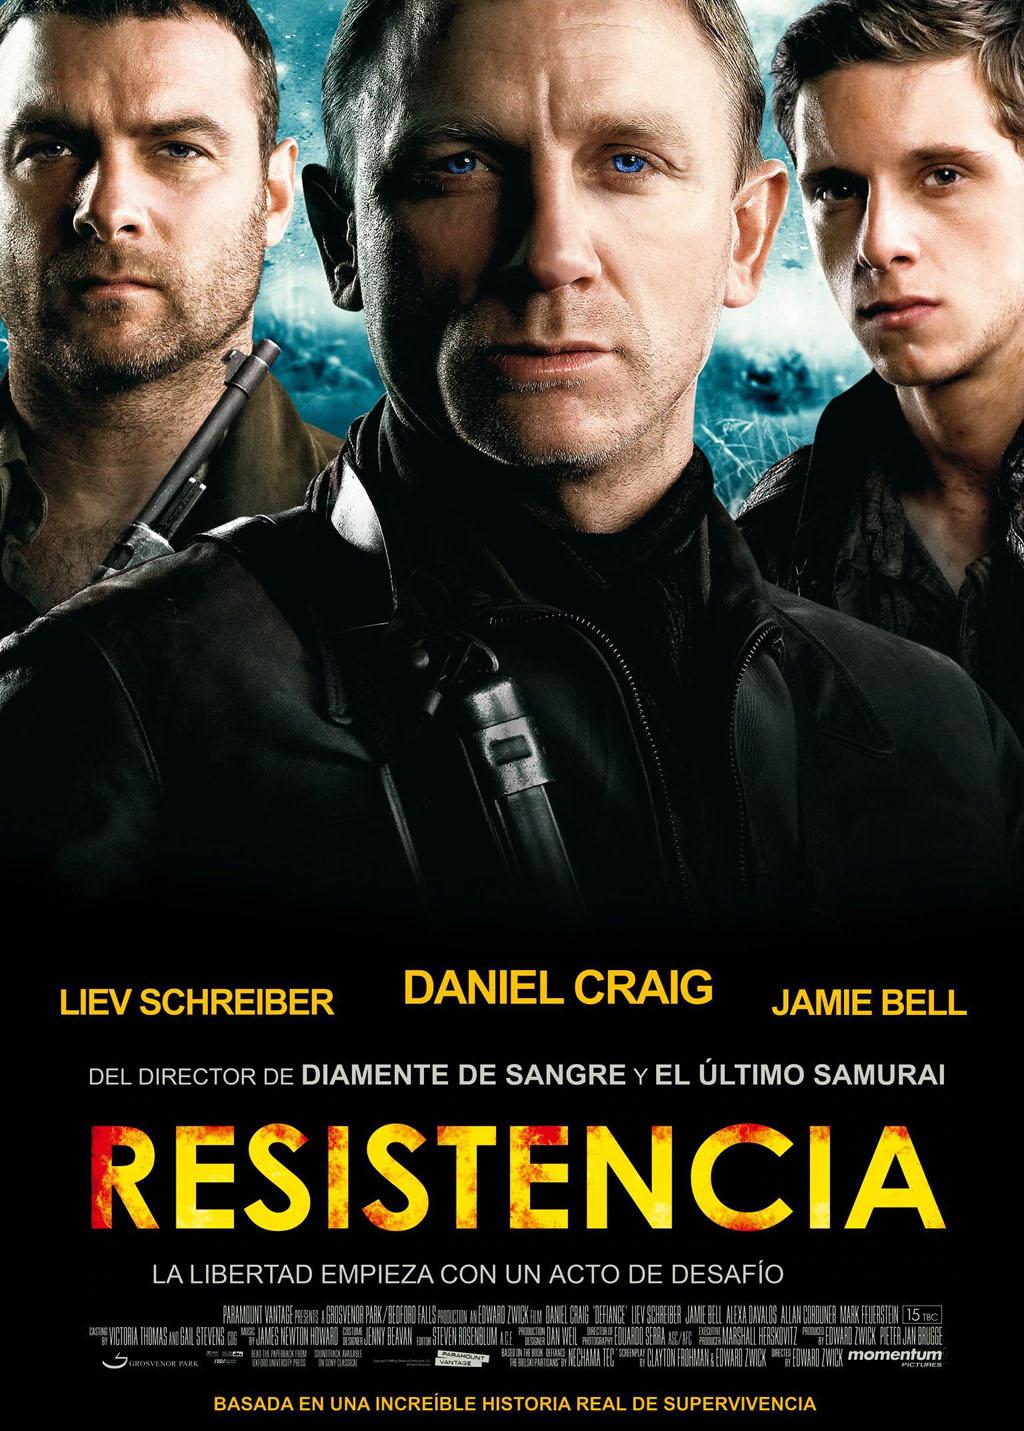 VISION ALTERNATIVA DEL CINE BELICO: RESISTENCIA (DEFIANCE)